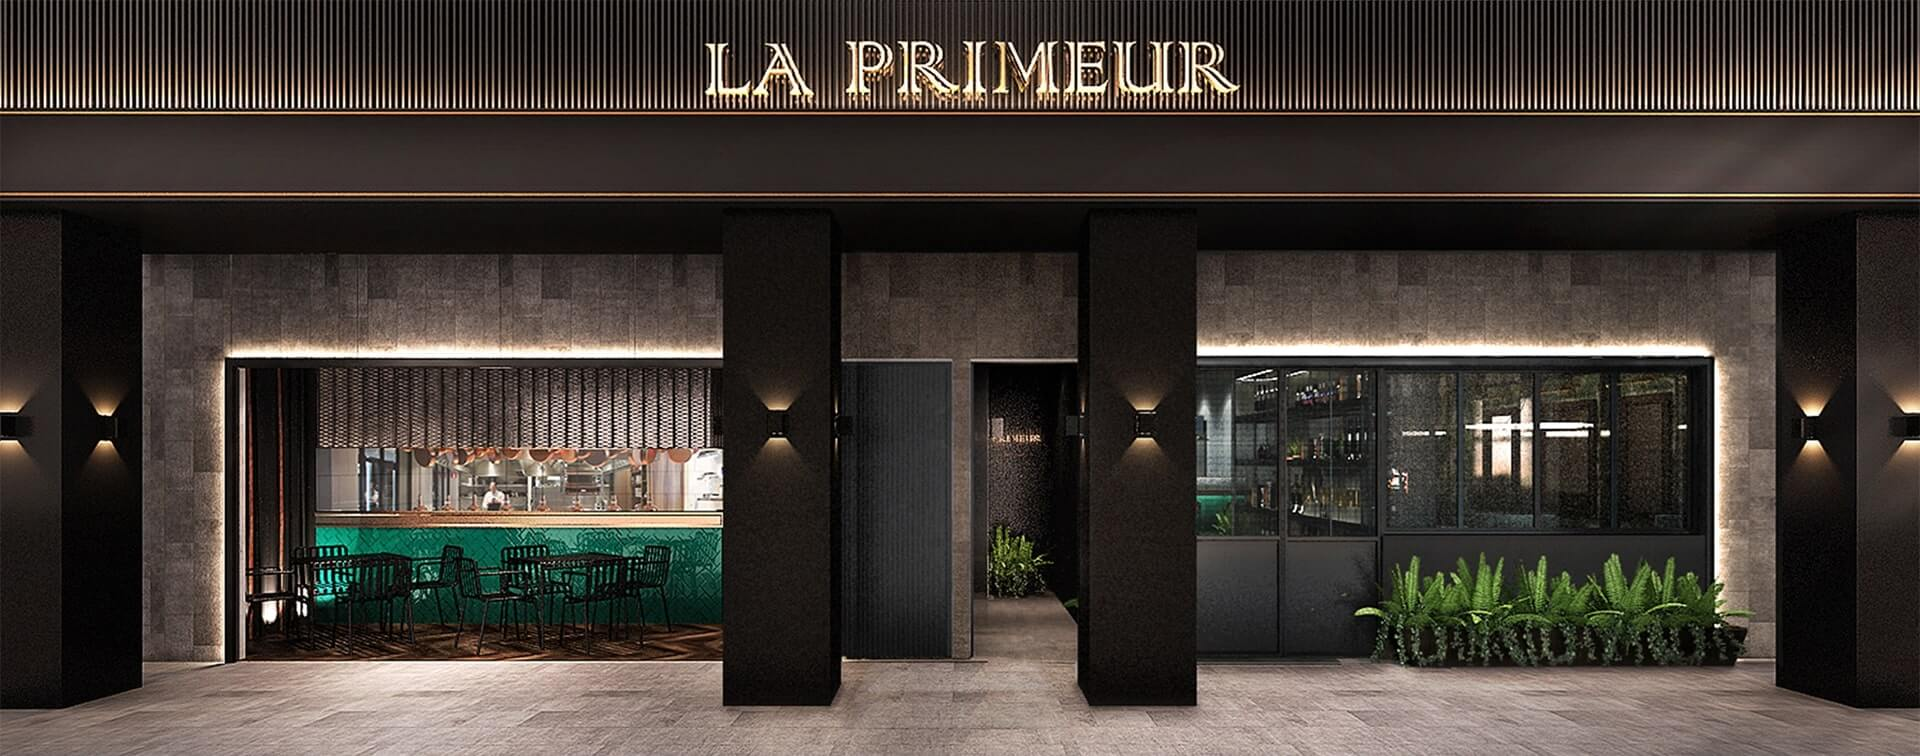 LA PRIMEUR RESTAURANT BAR